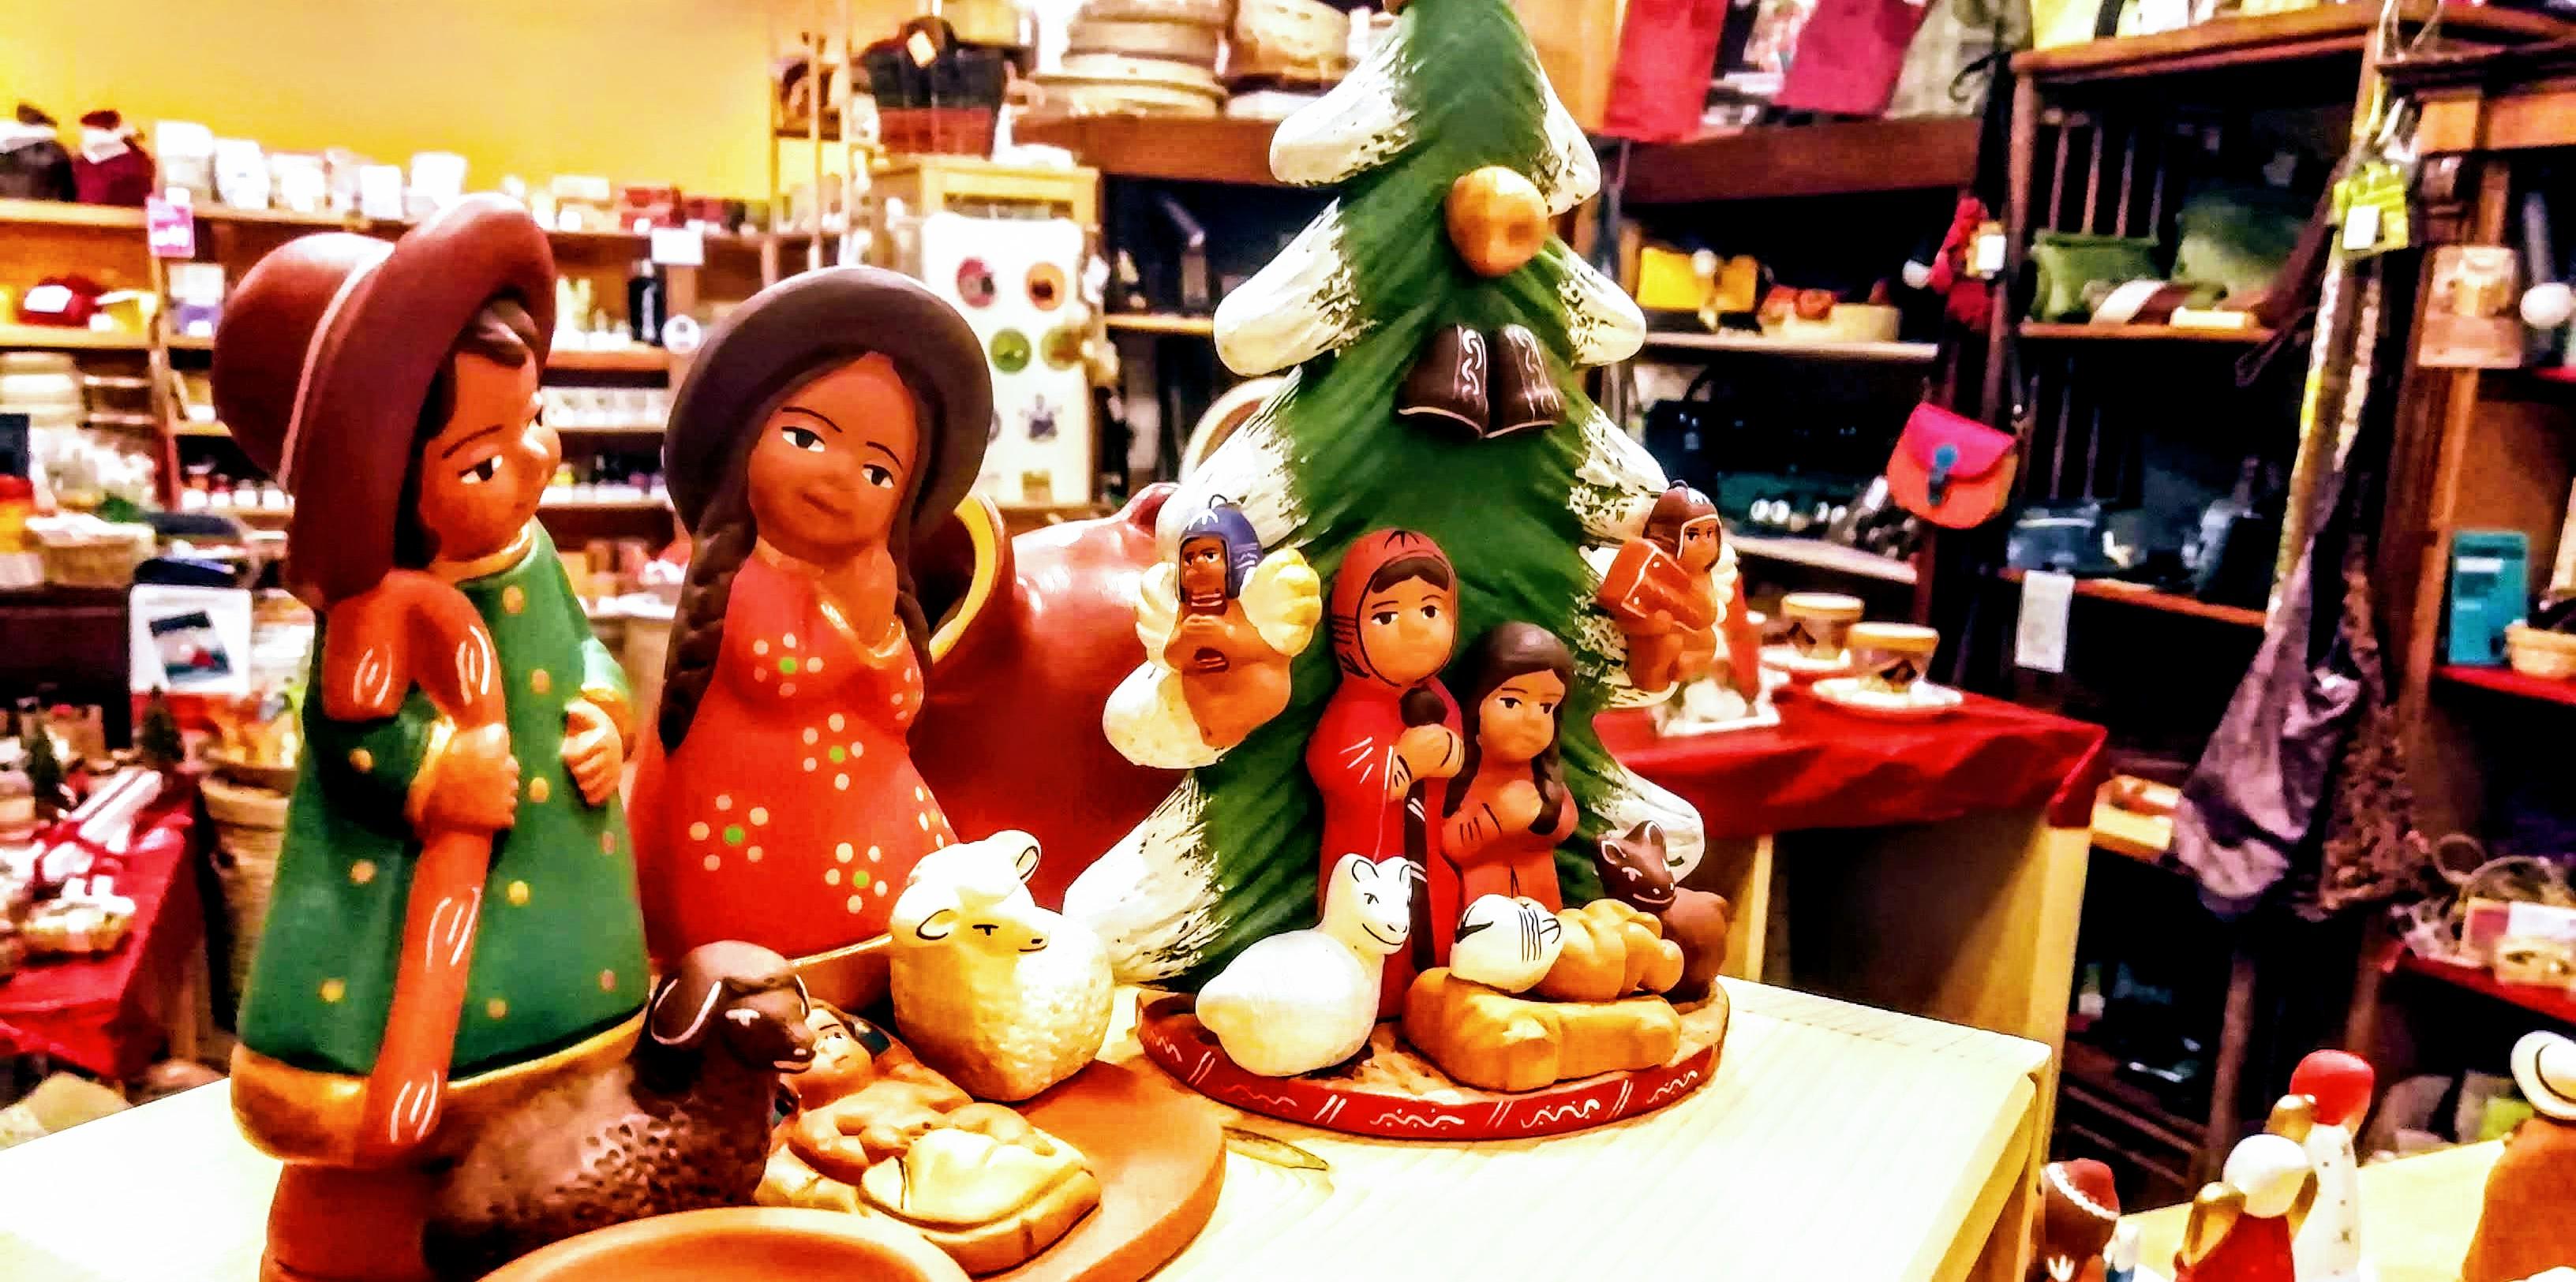 Natale nelle botteghe